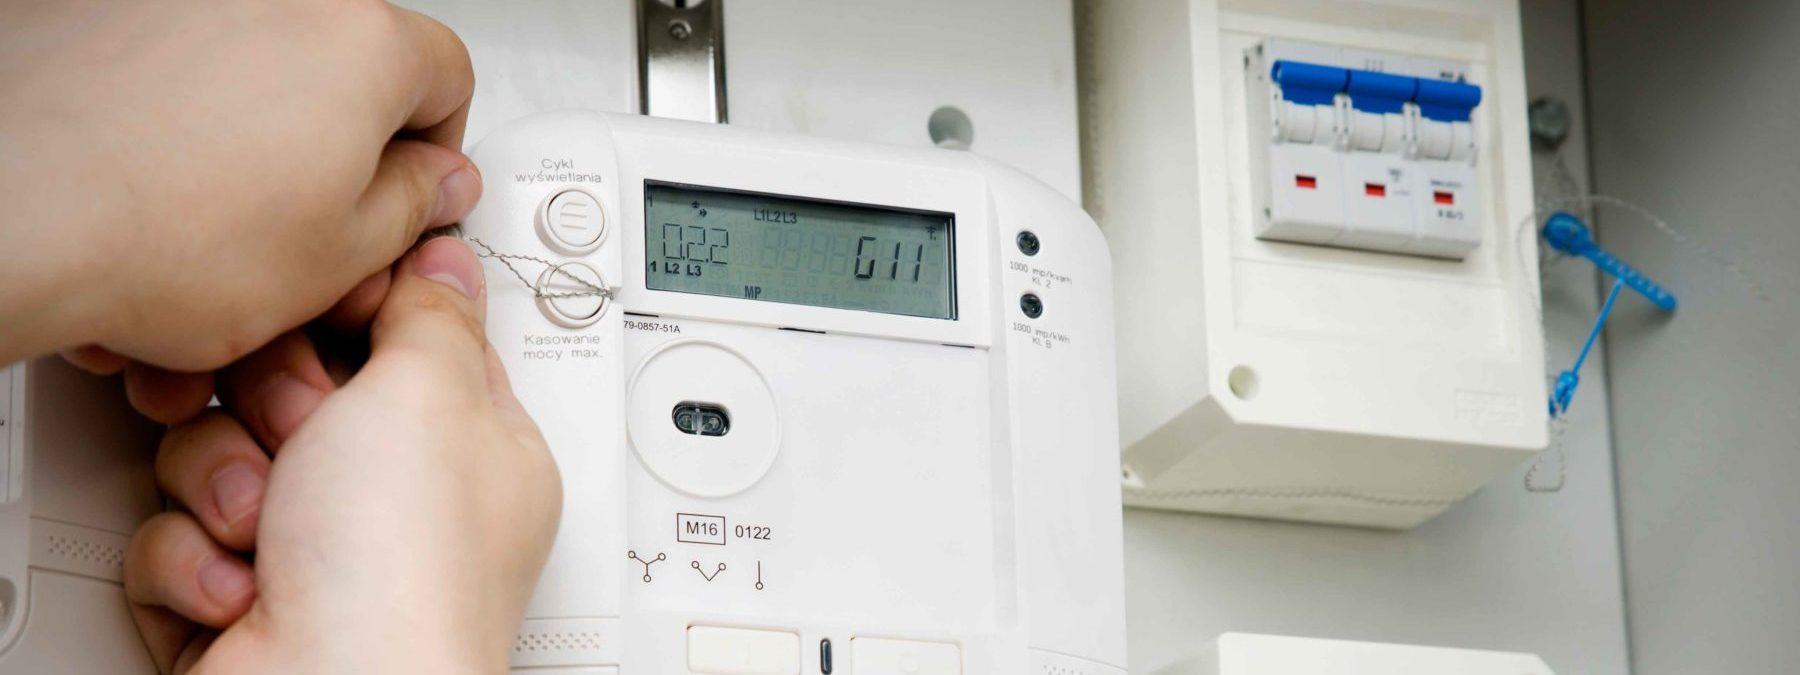 Free-Smat-Meters---NSW-Solar-Bonus-Scheme---Keen-2B-Green